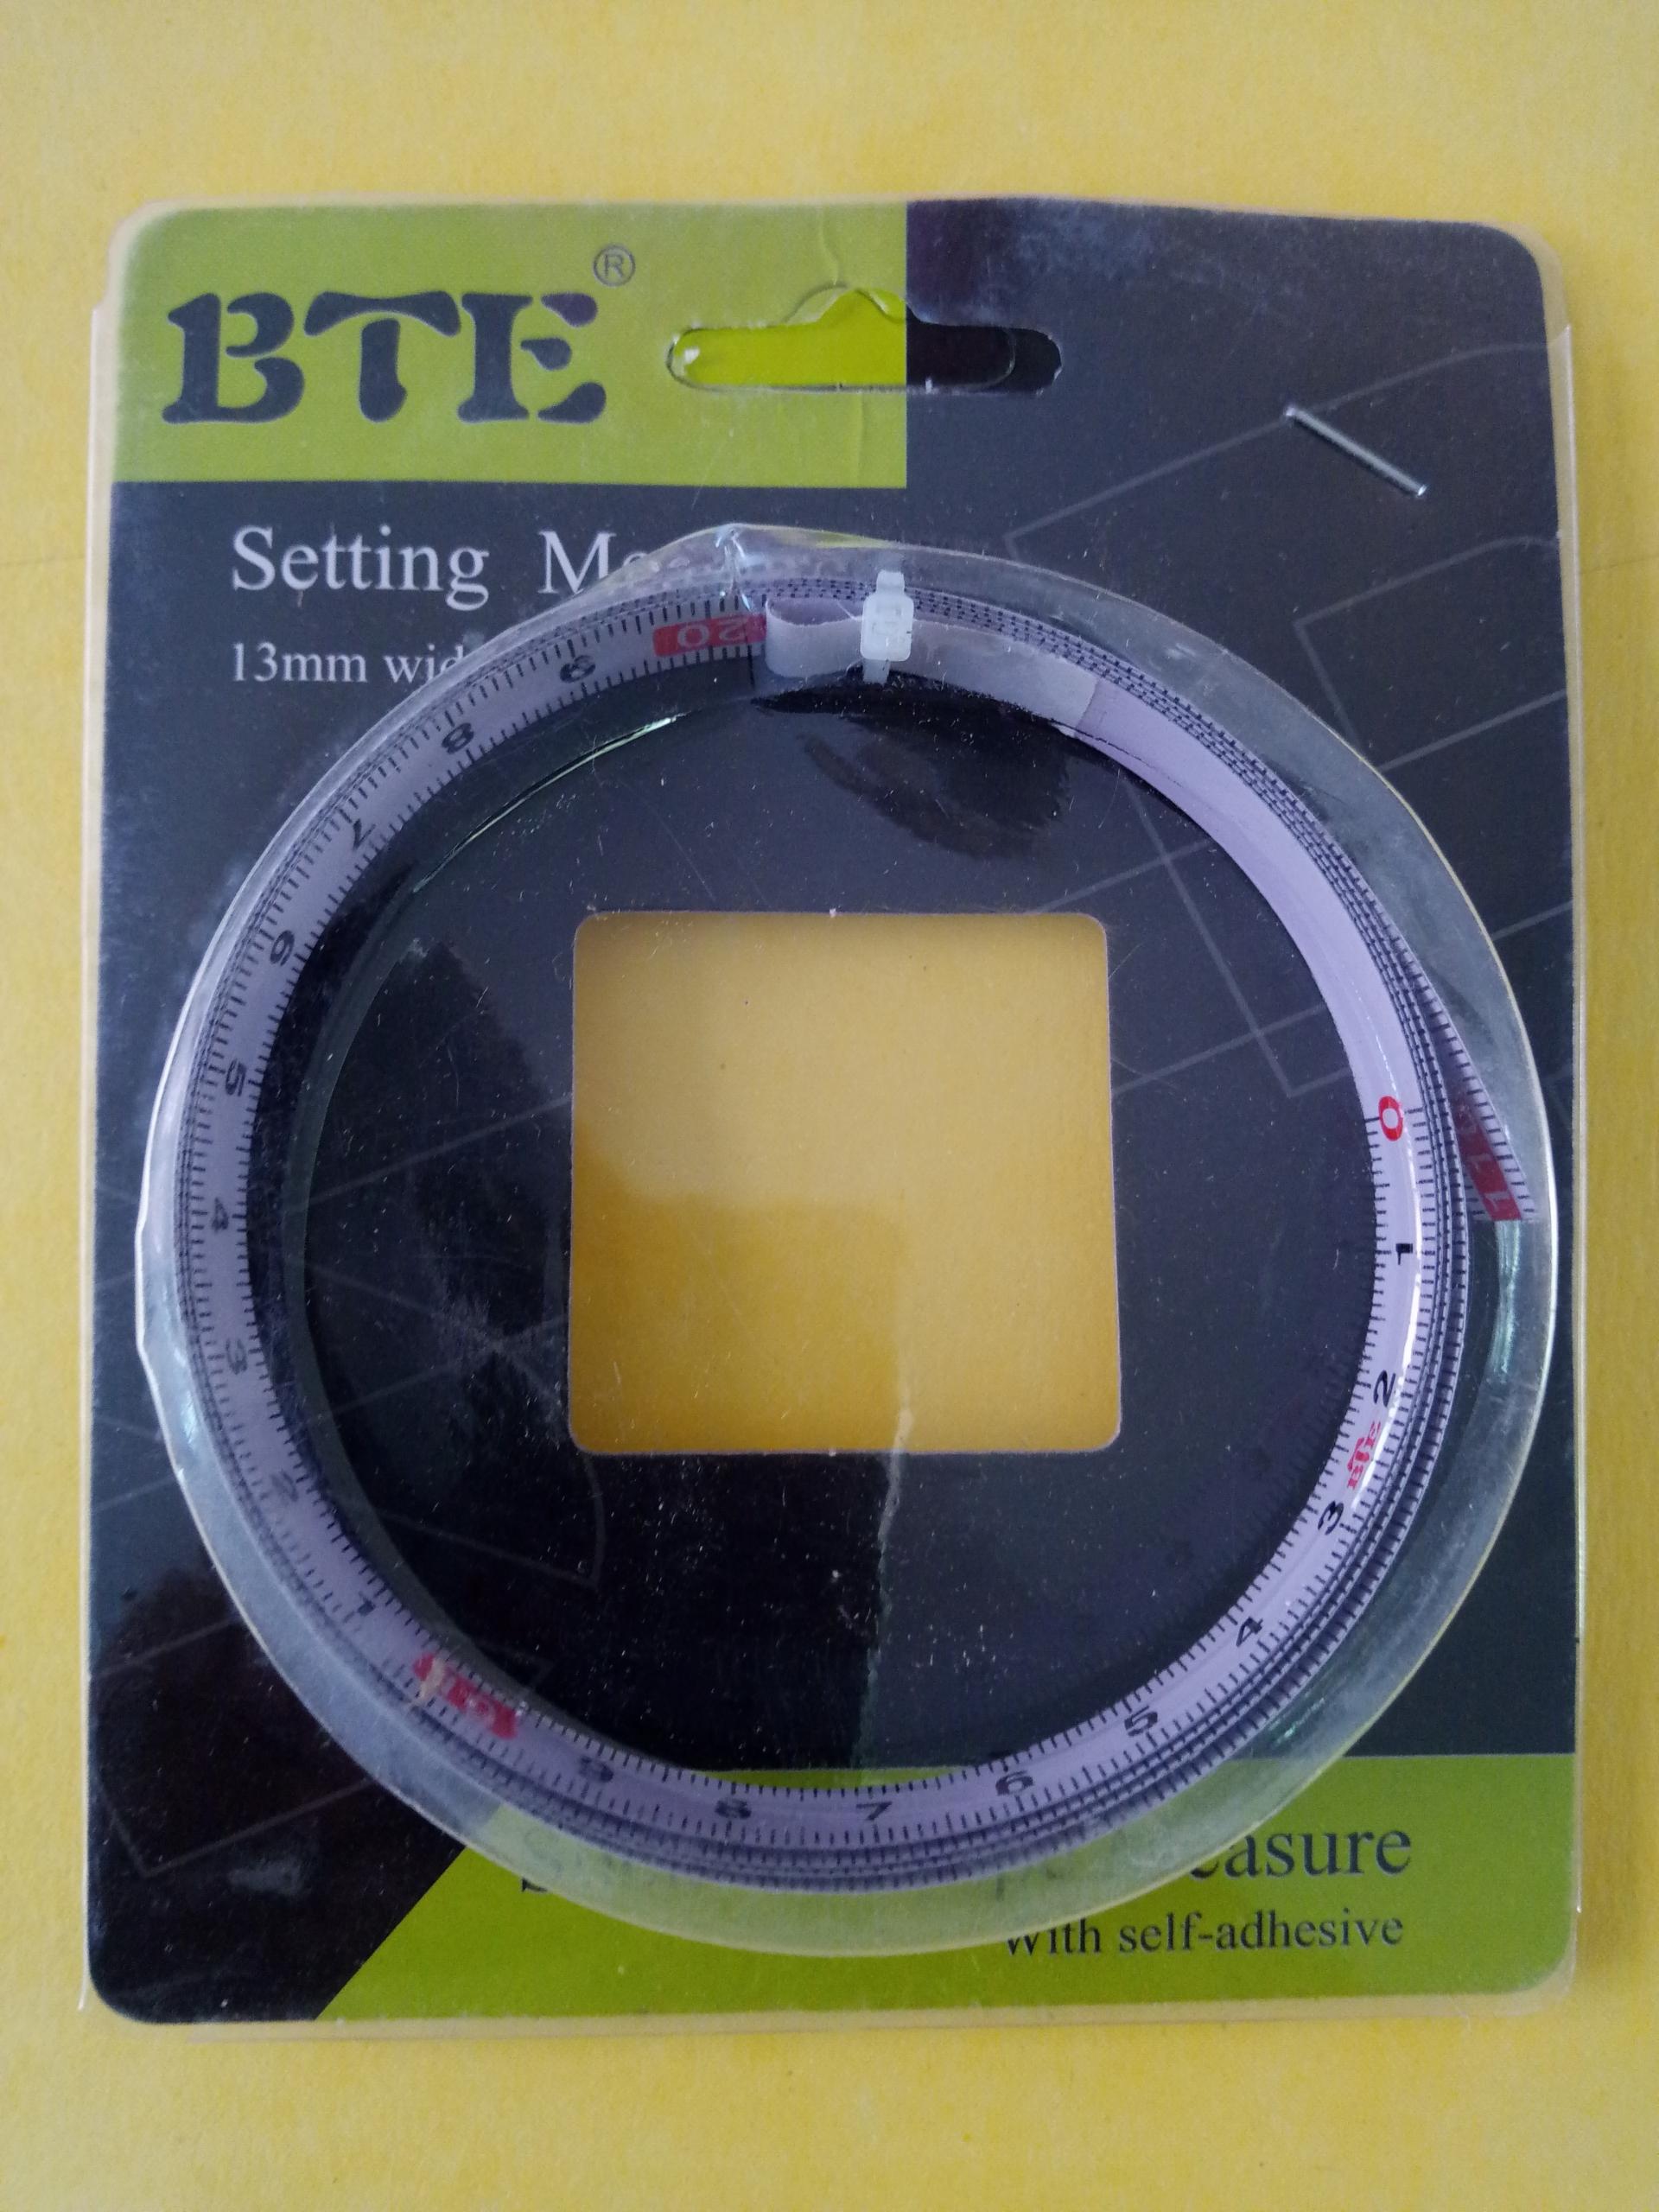 BTE 1.1 Meter Self Adhesive Measuring Tape (R to L)- เทปวัดระยะมีแถบกาวในตัวด้านหลัง อ่านระยะจากขวาไปซ้ายยาว 1.1 ม.